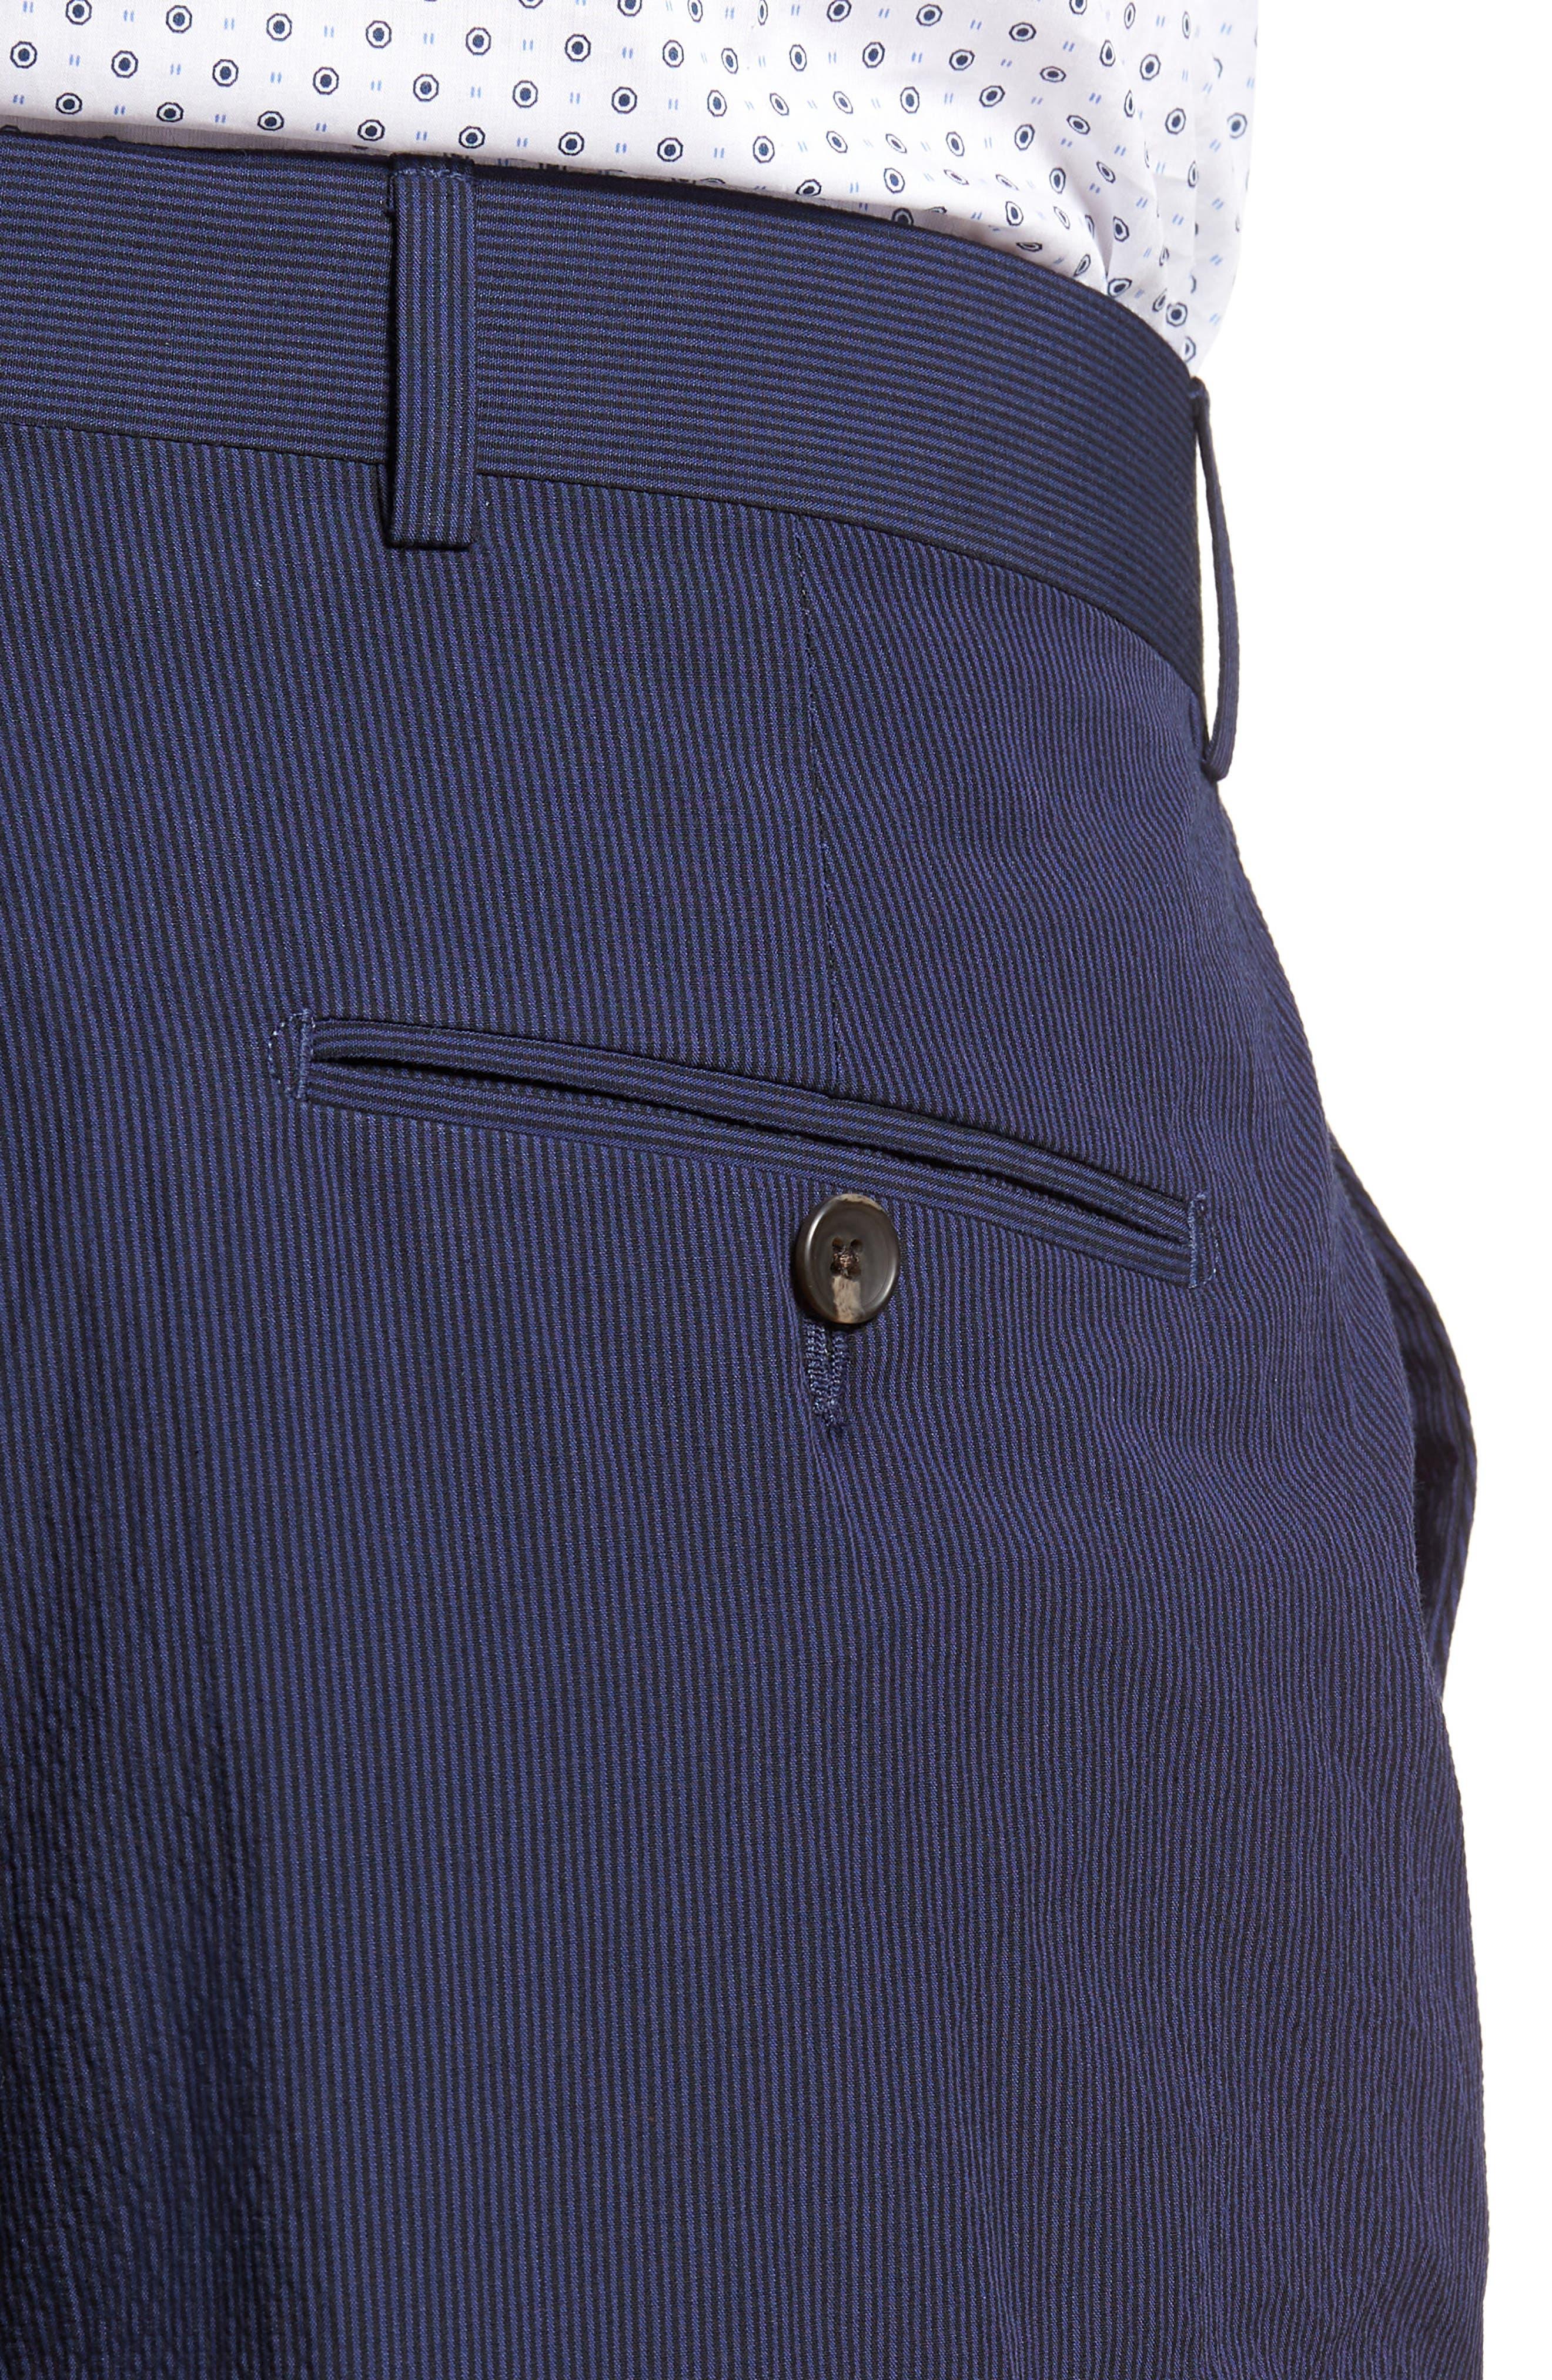 Dagger Flat Front Seersucker Trousers,                             Alternate thumbnail 4, color,                             400